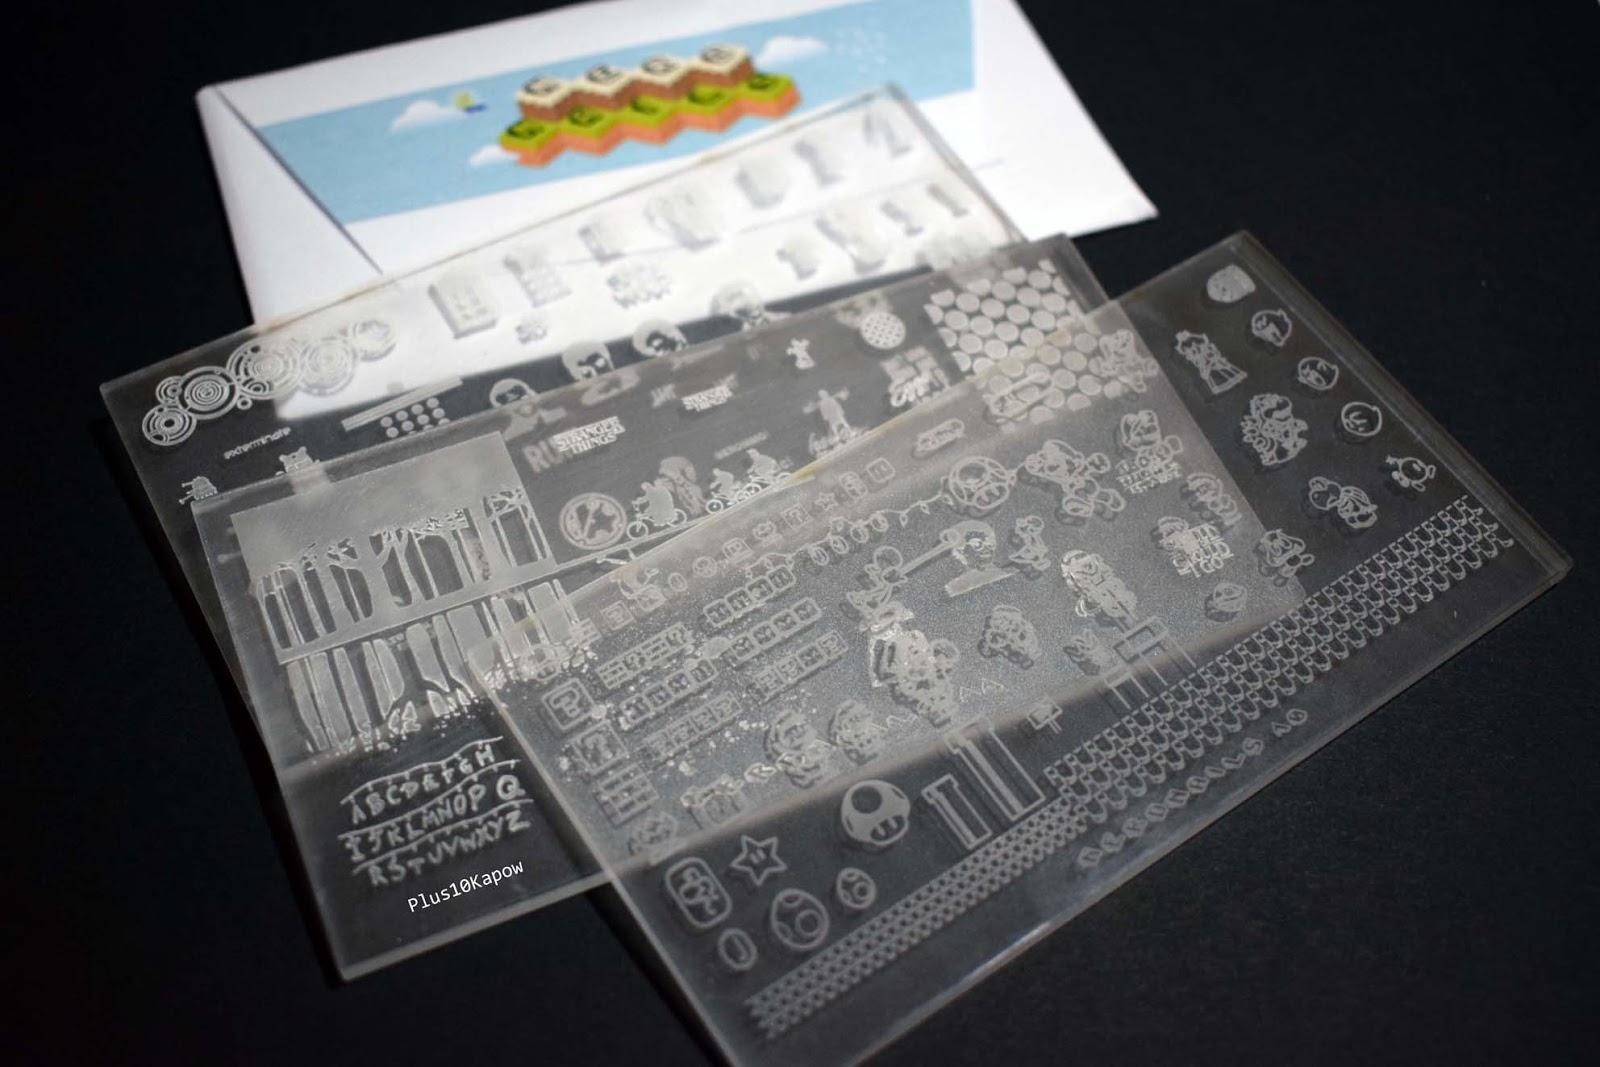 Plus10Kapow: Nerd Nails Acrylic Stamping Plates